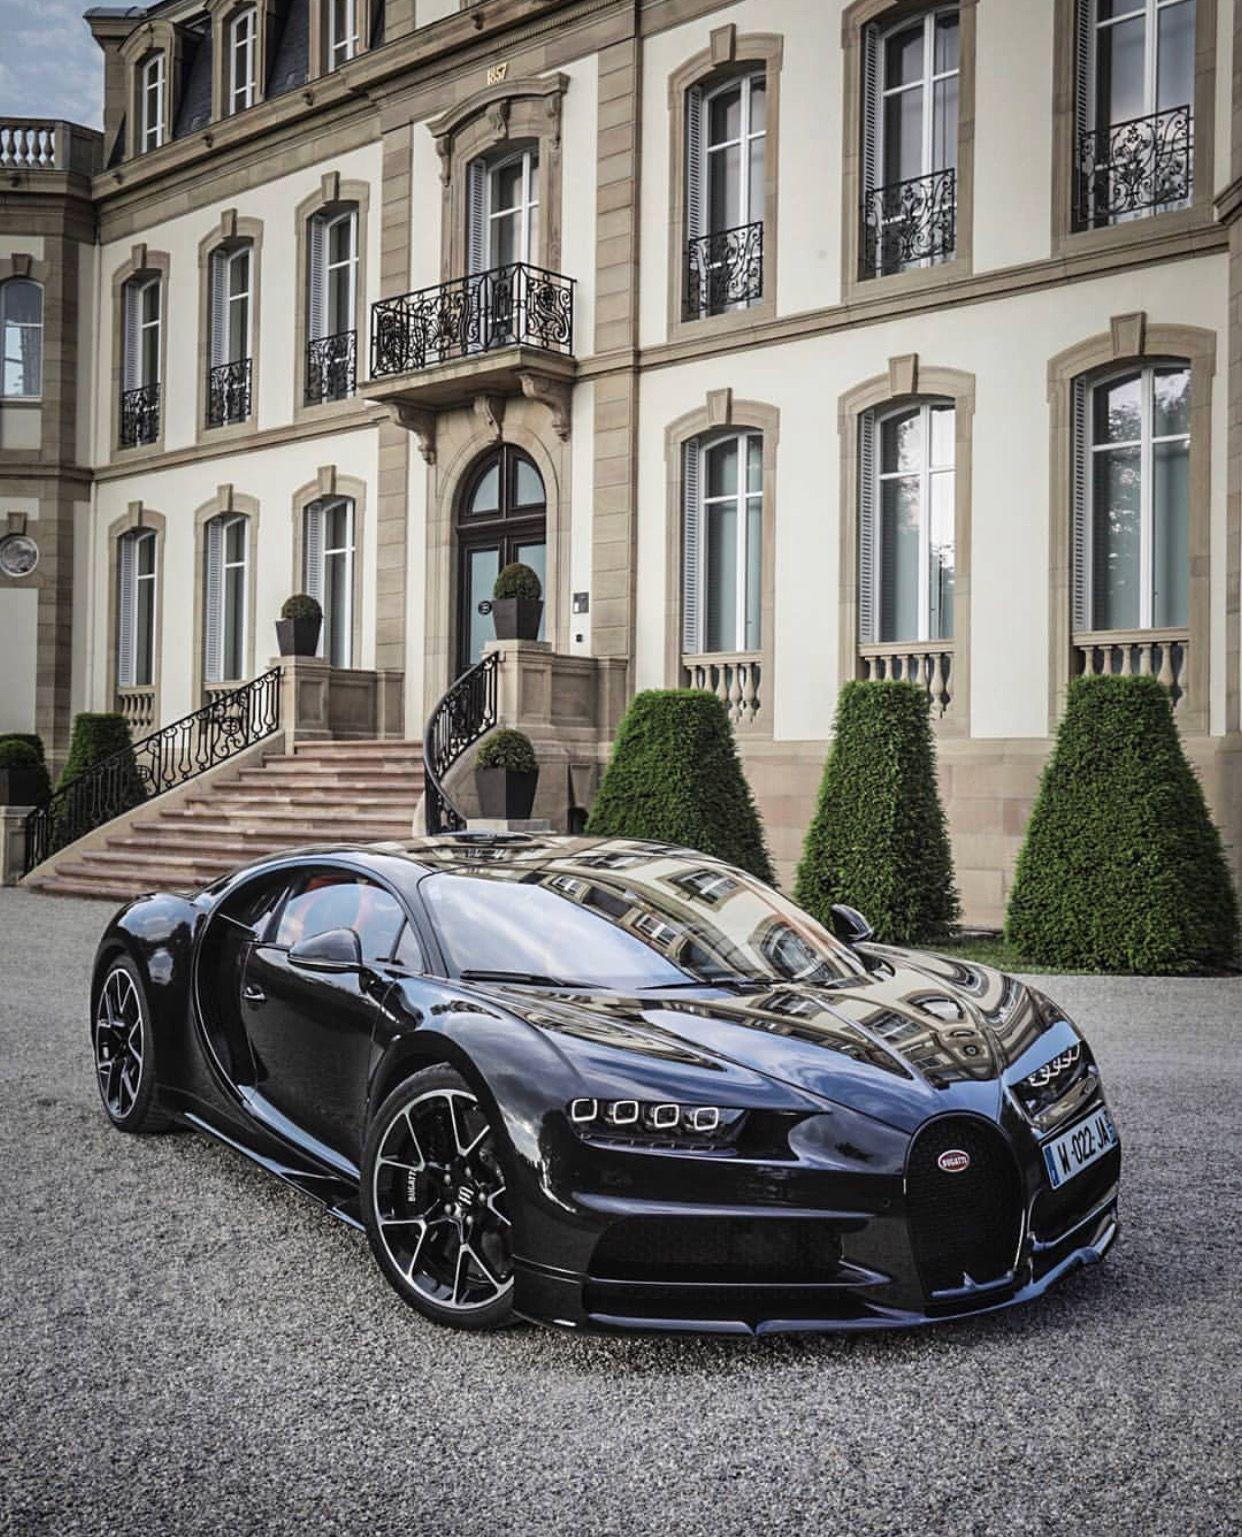 Pin By Virginia Santoyo On Bad Cars Best Luxury Cars Bugatti Cars Lamborghini Cars